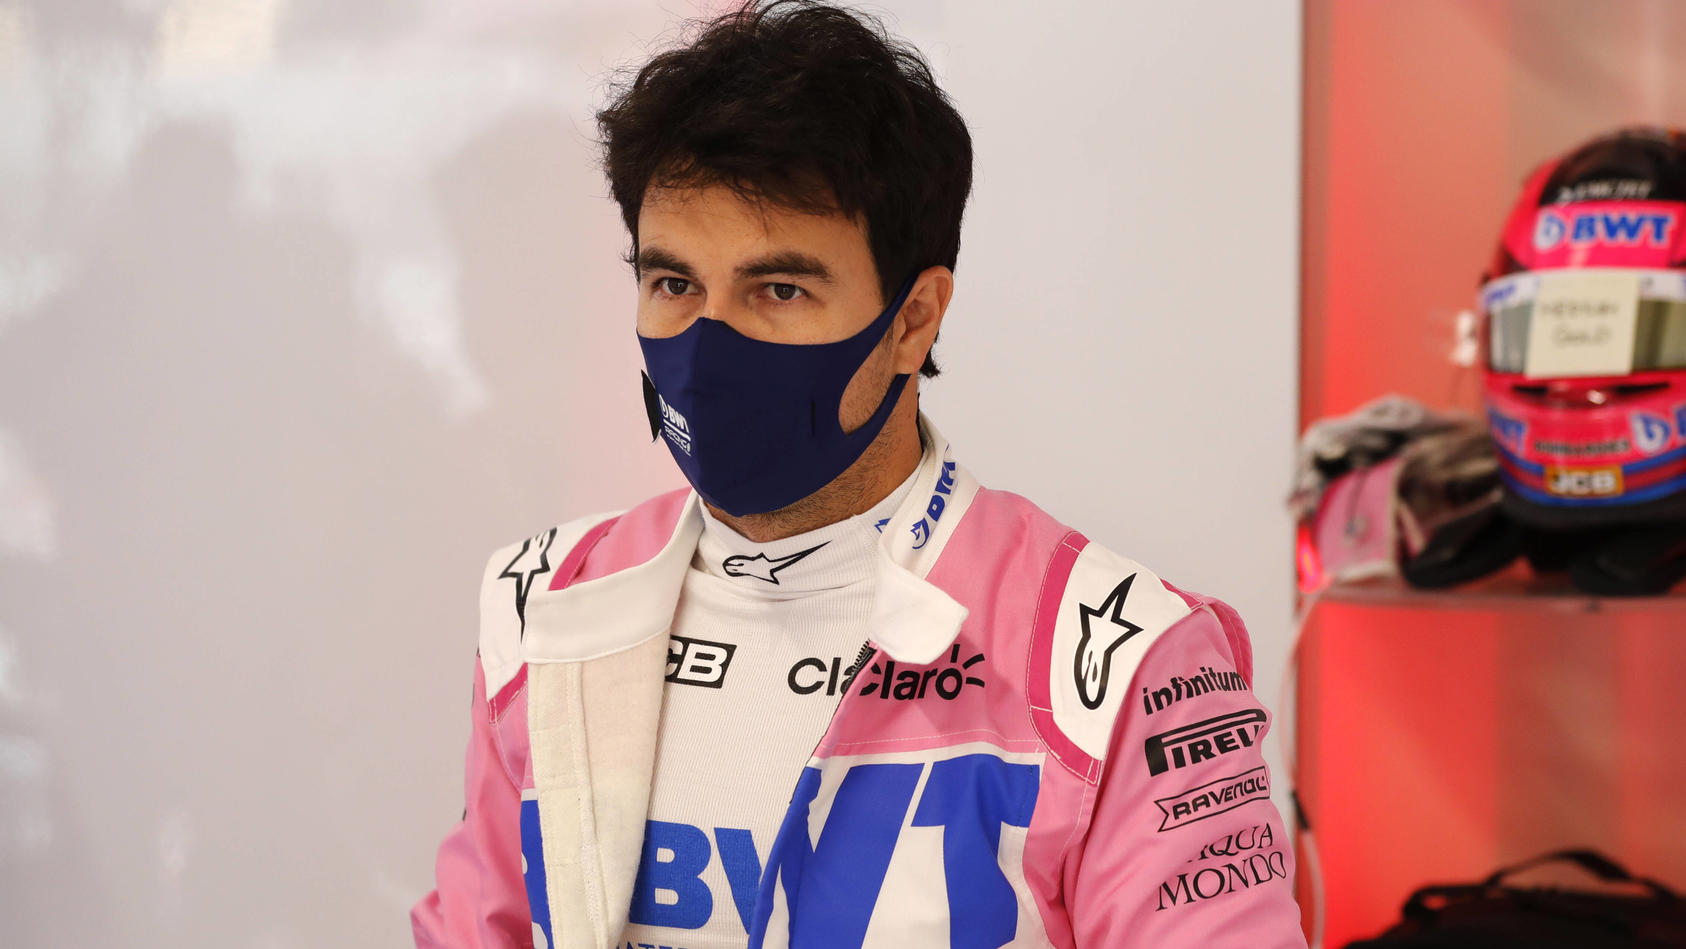 Motorsports: FIA Formula One World Championship, WM, Weltmeisterschaft 2020, Grand Prix of Hungary Motorsports: FIA Form